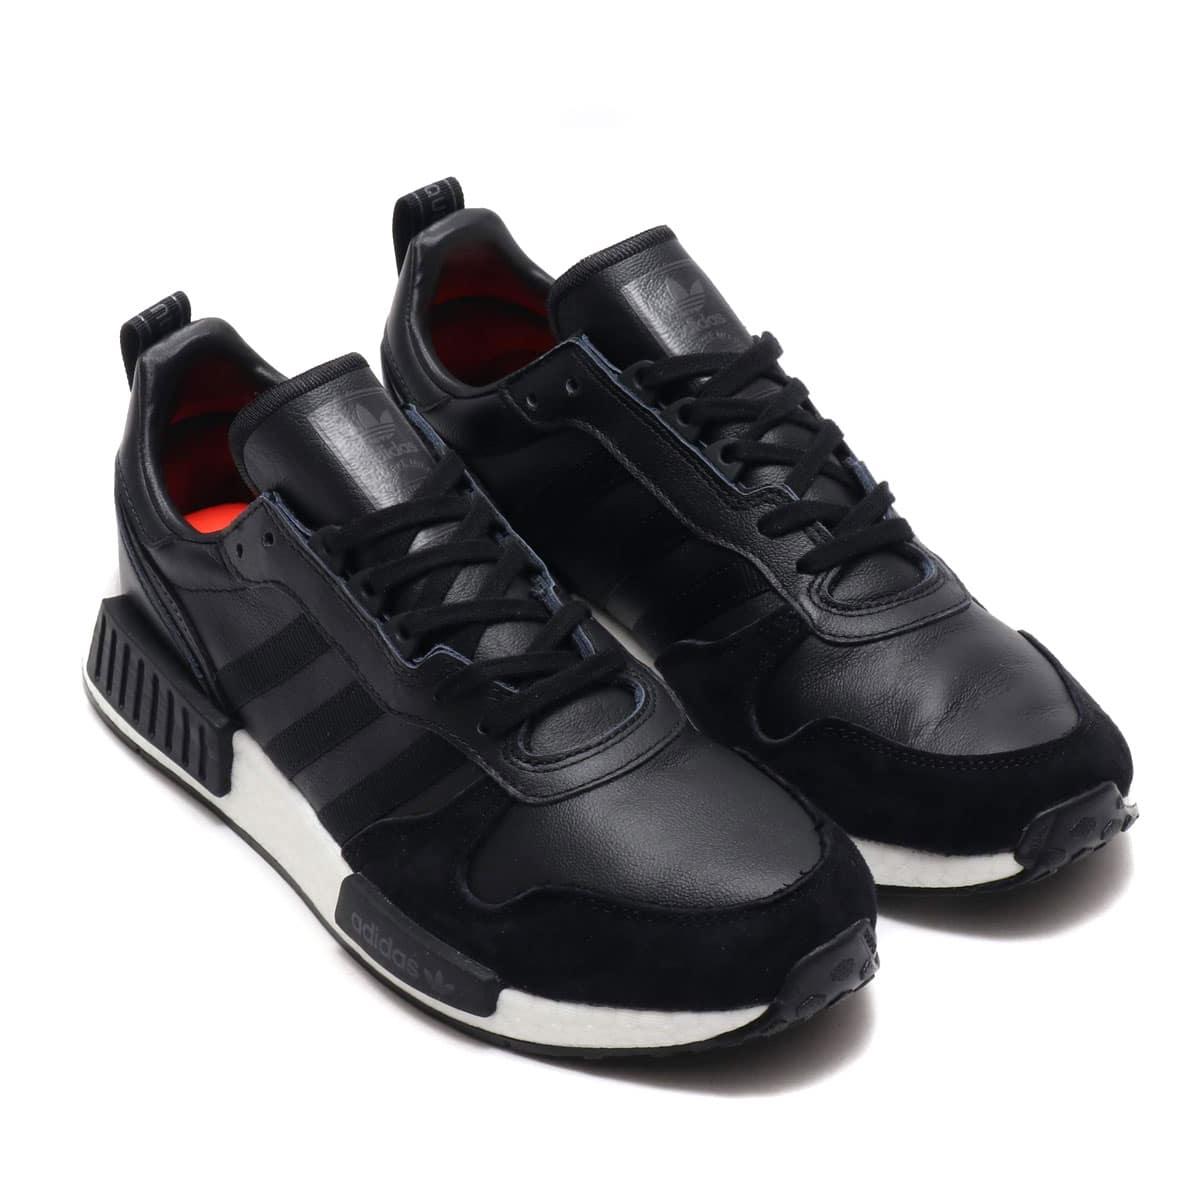 adidas RISINGSTAR x R1 BLACK